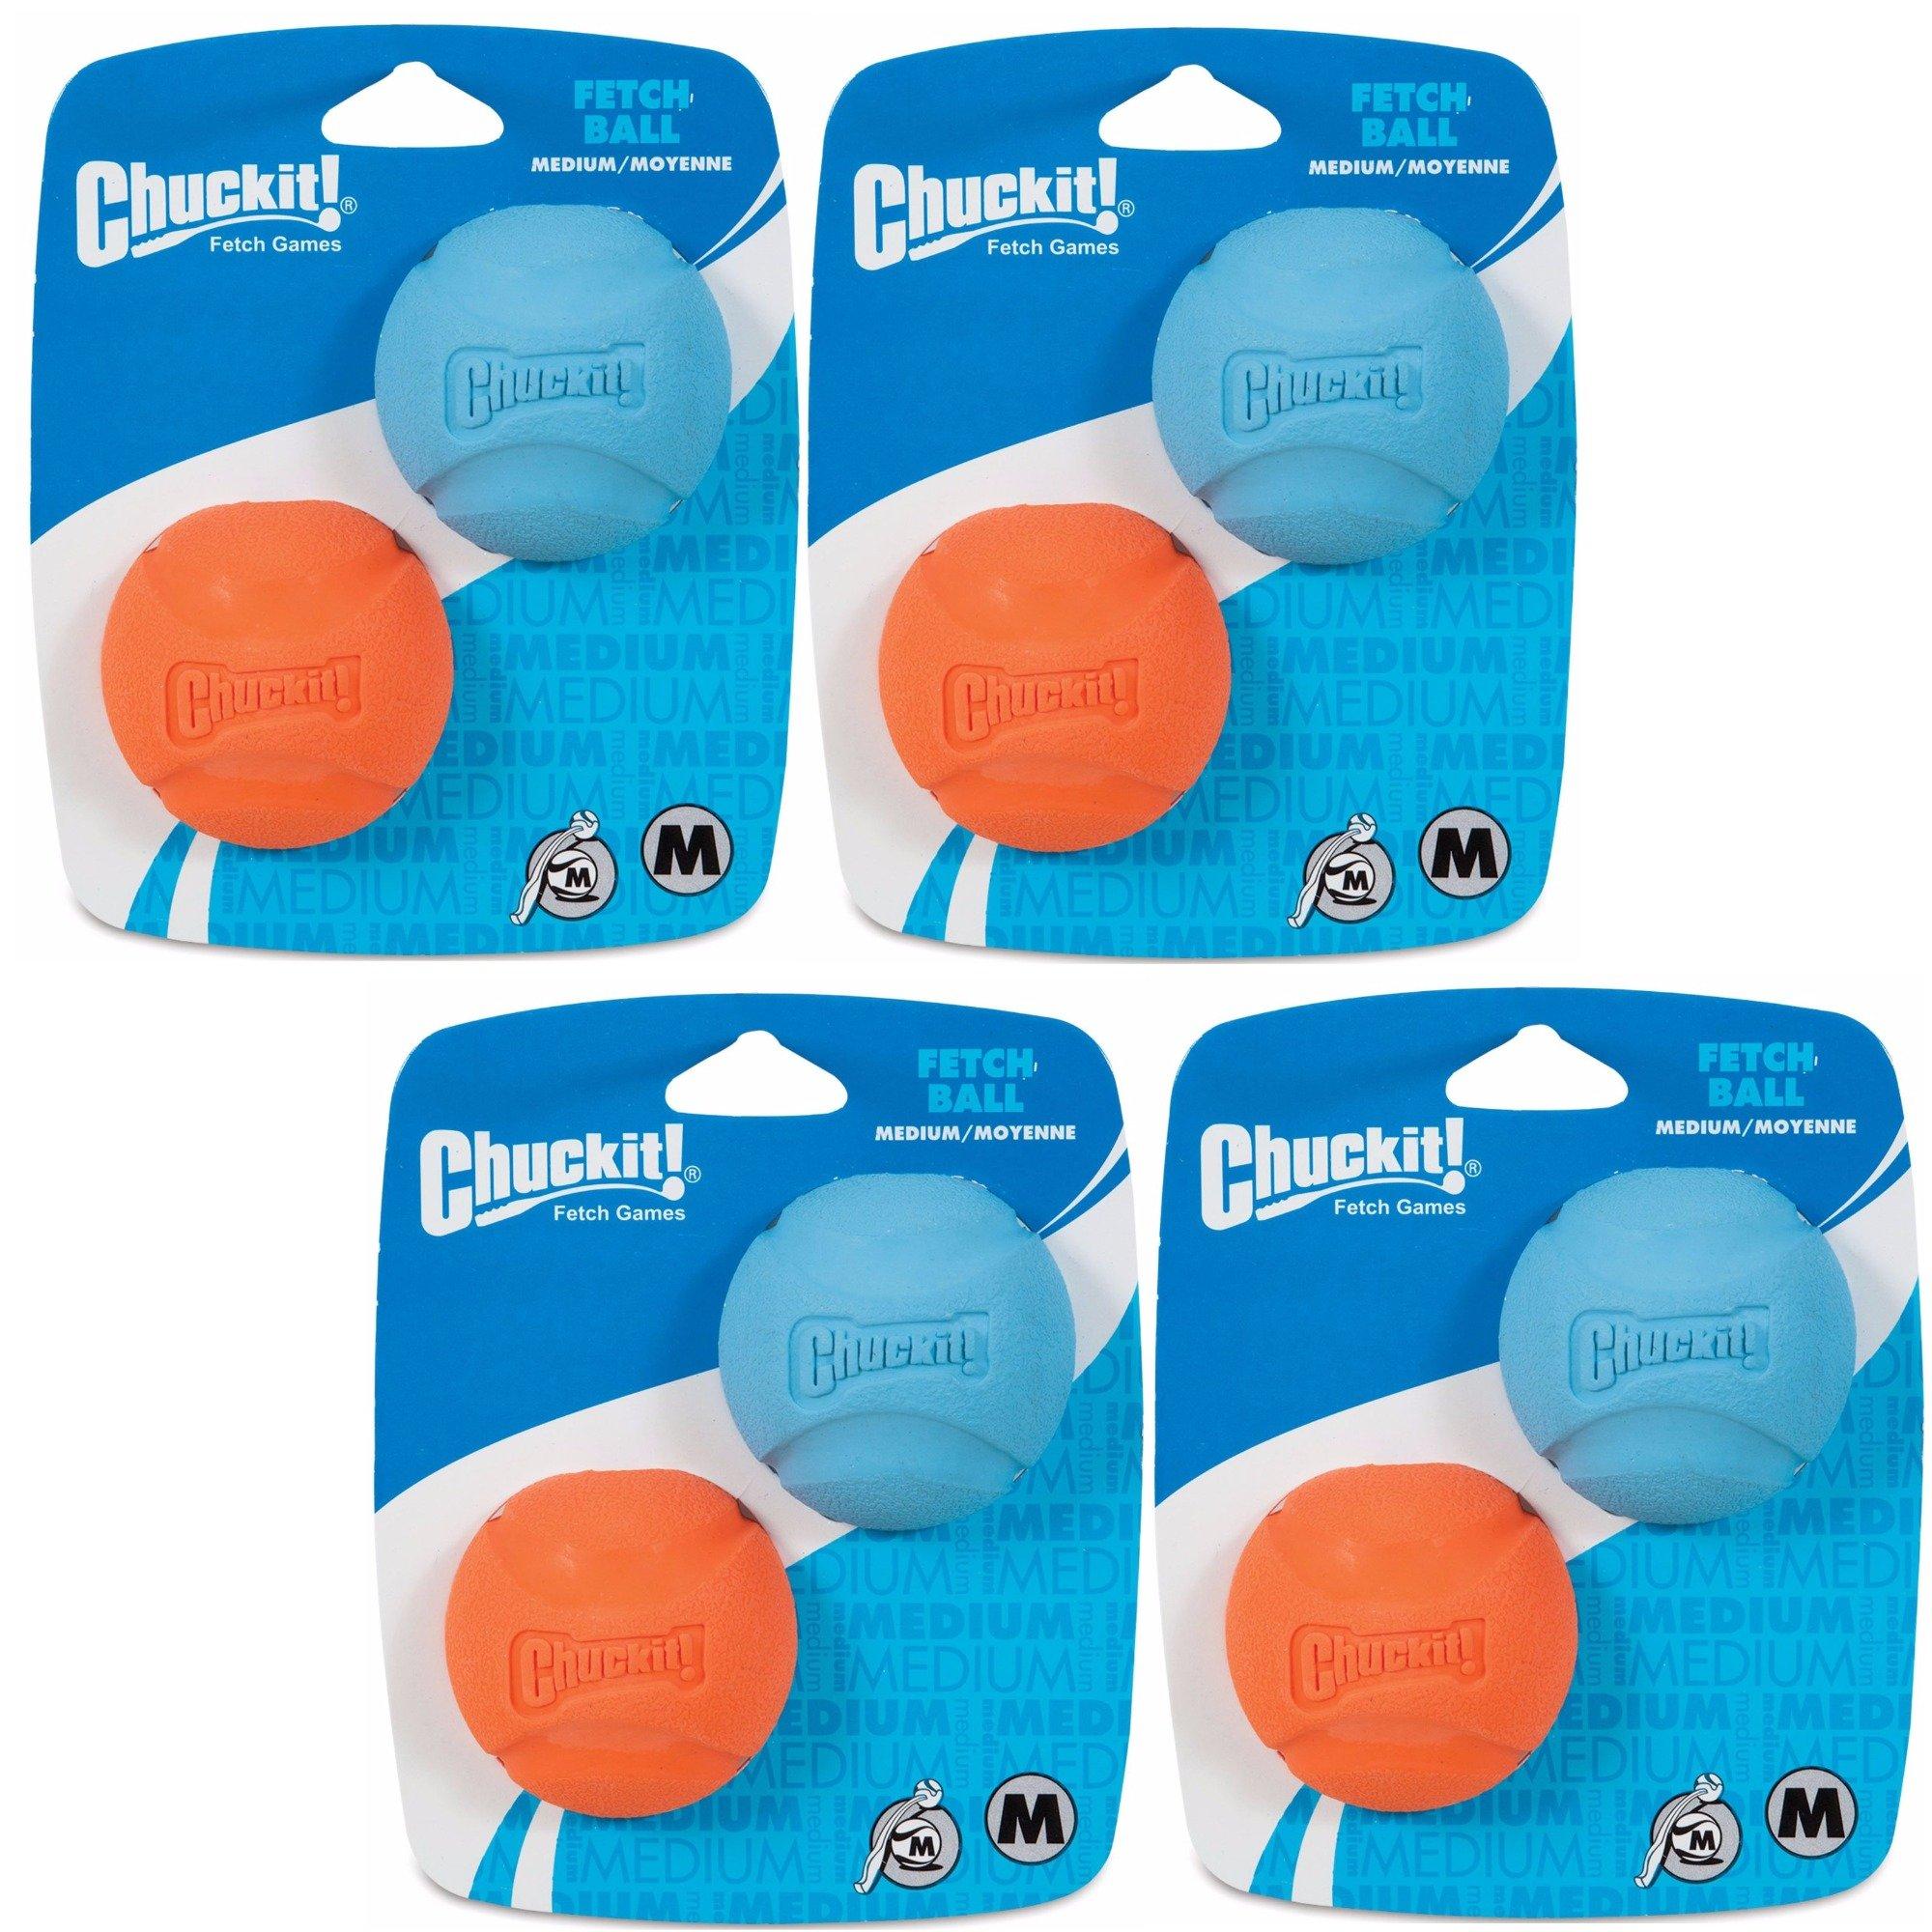 Chuckit! Dog Fetch Toy Fetch Ball Durable Rubber Fits Launcher Medium 8 Balls